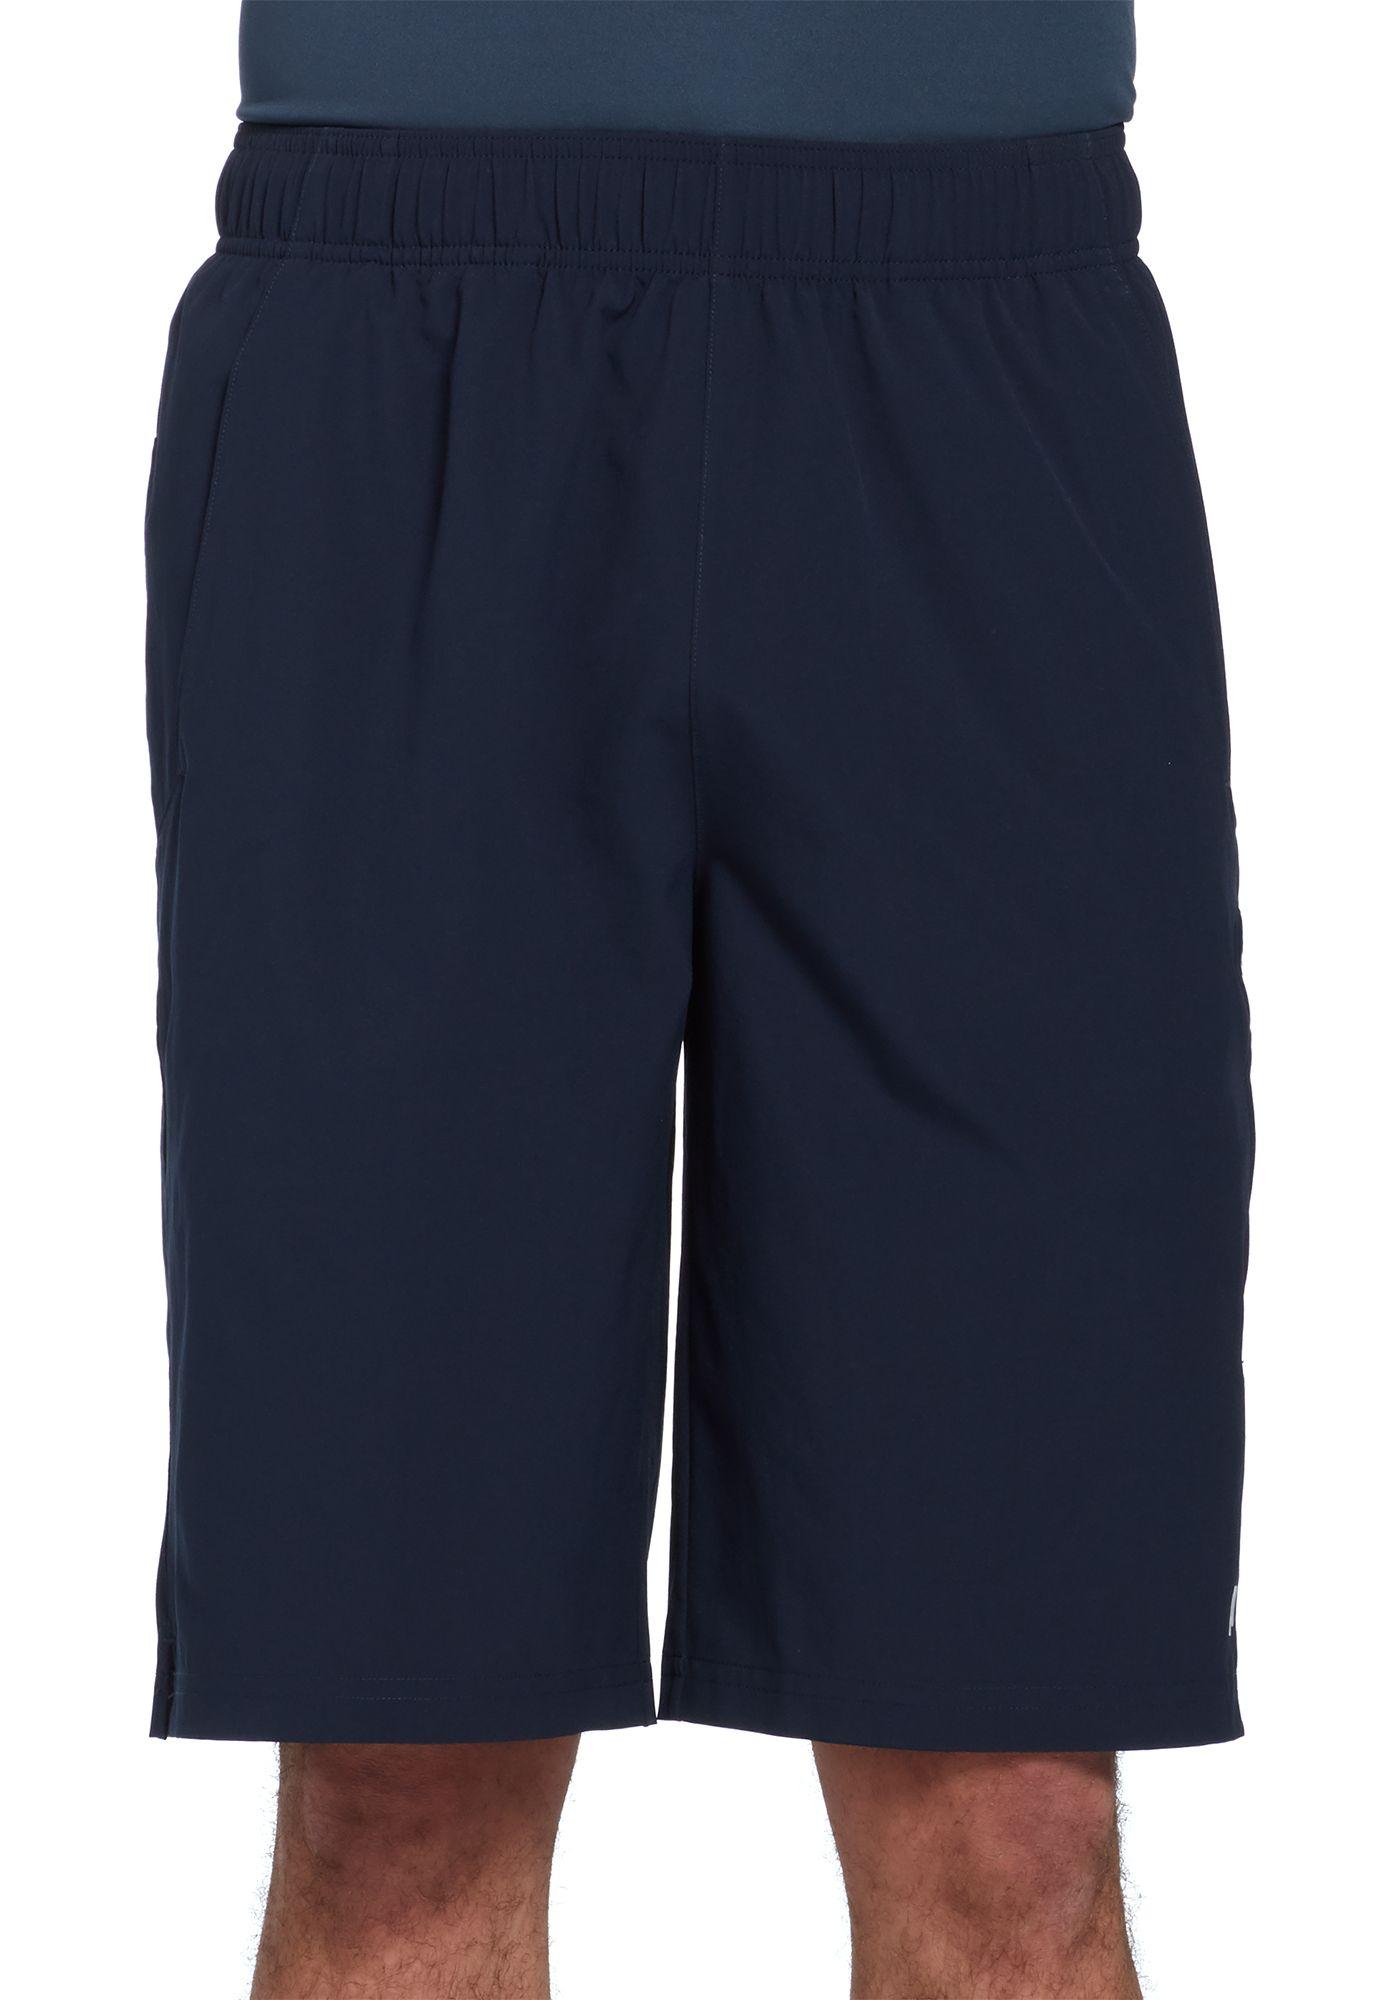 "Prince Men's Match 11"" Tennis Shorts"